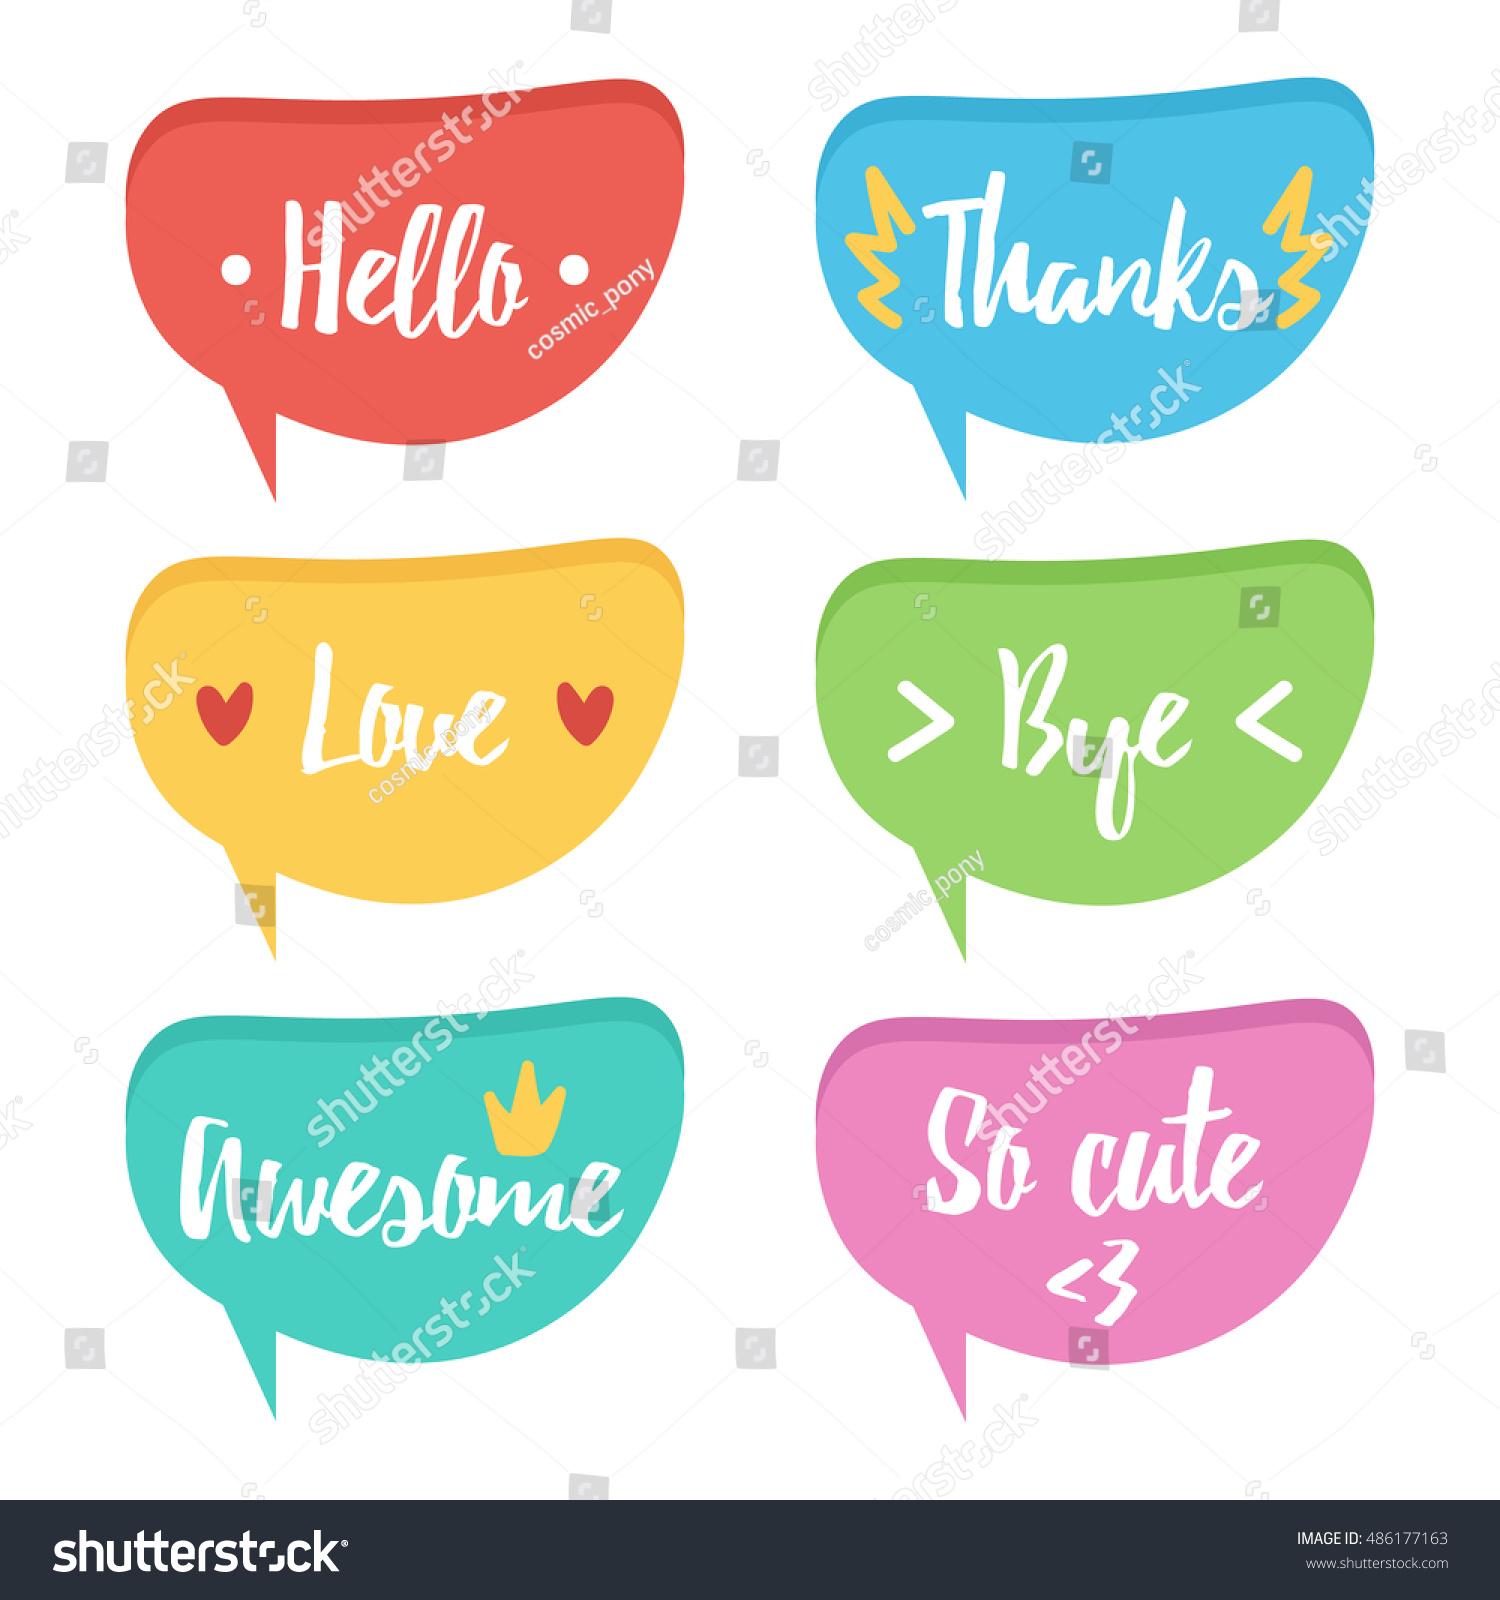 Cute Colorful Speech Bubble Set Collection Stock Vector